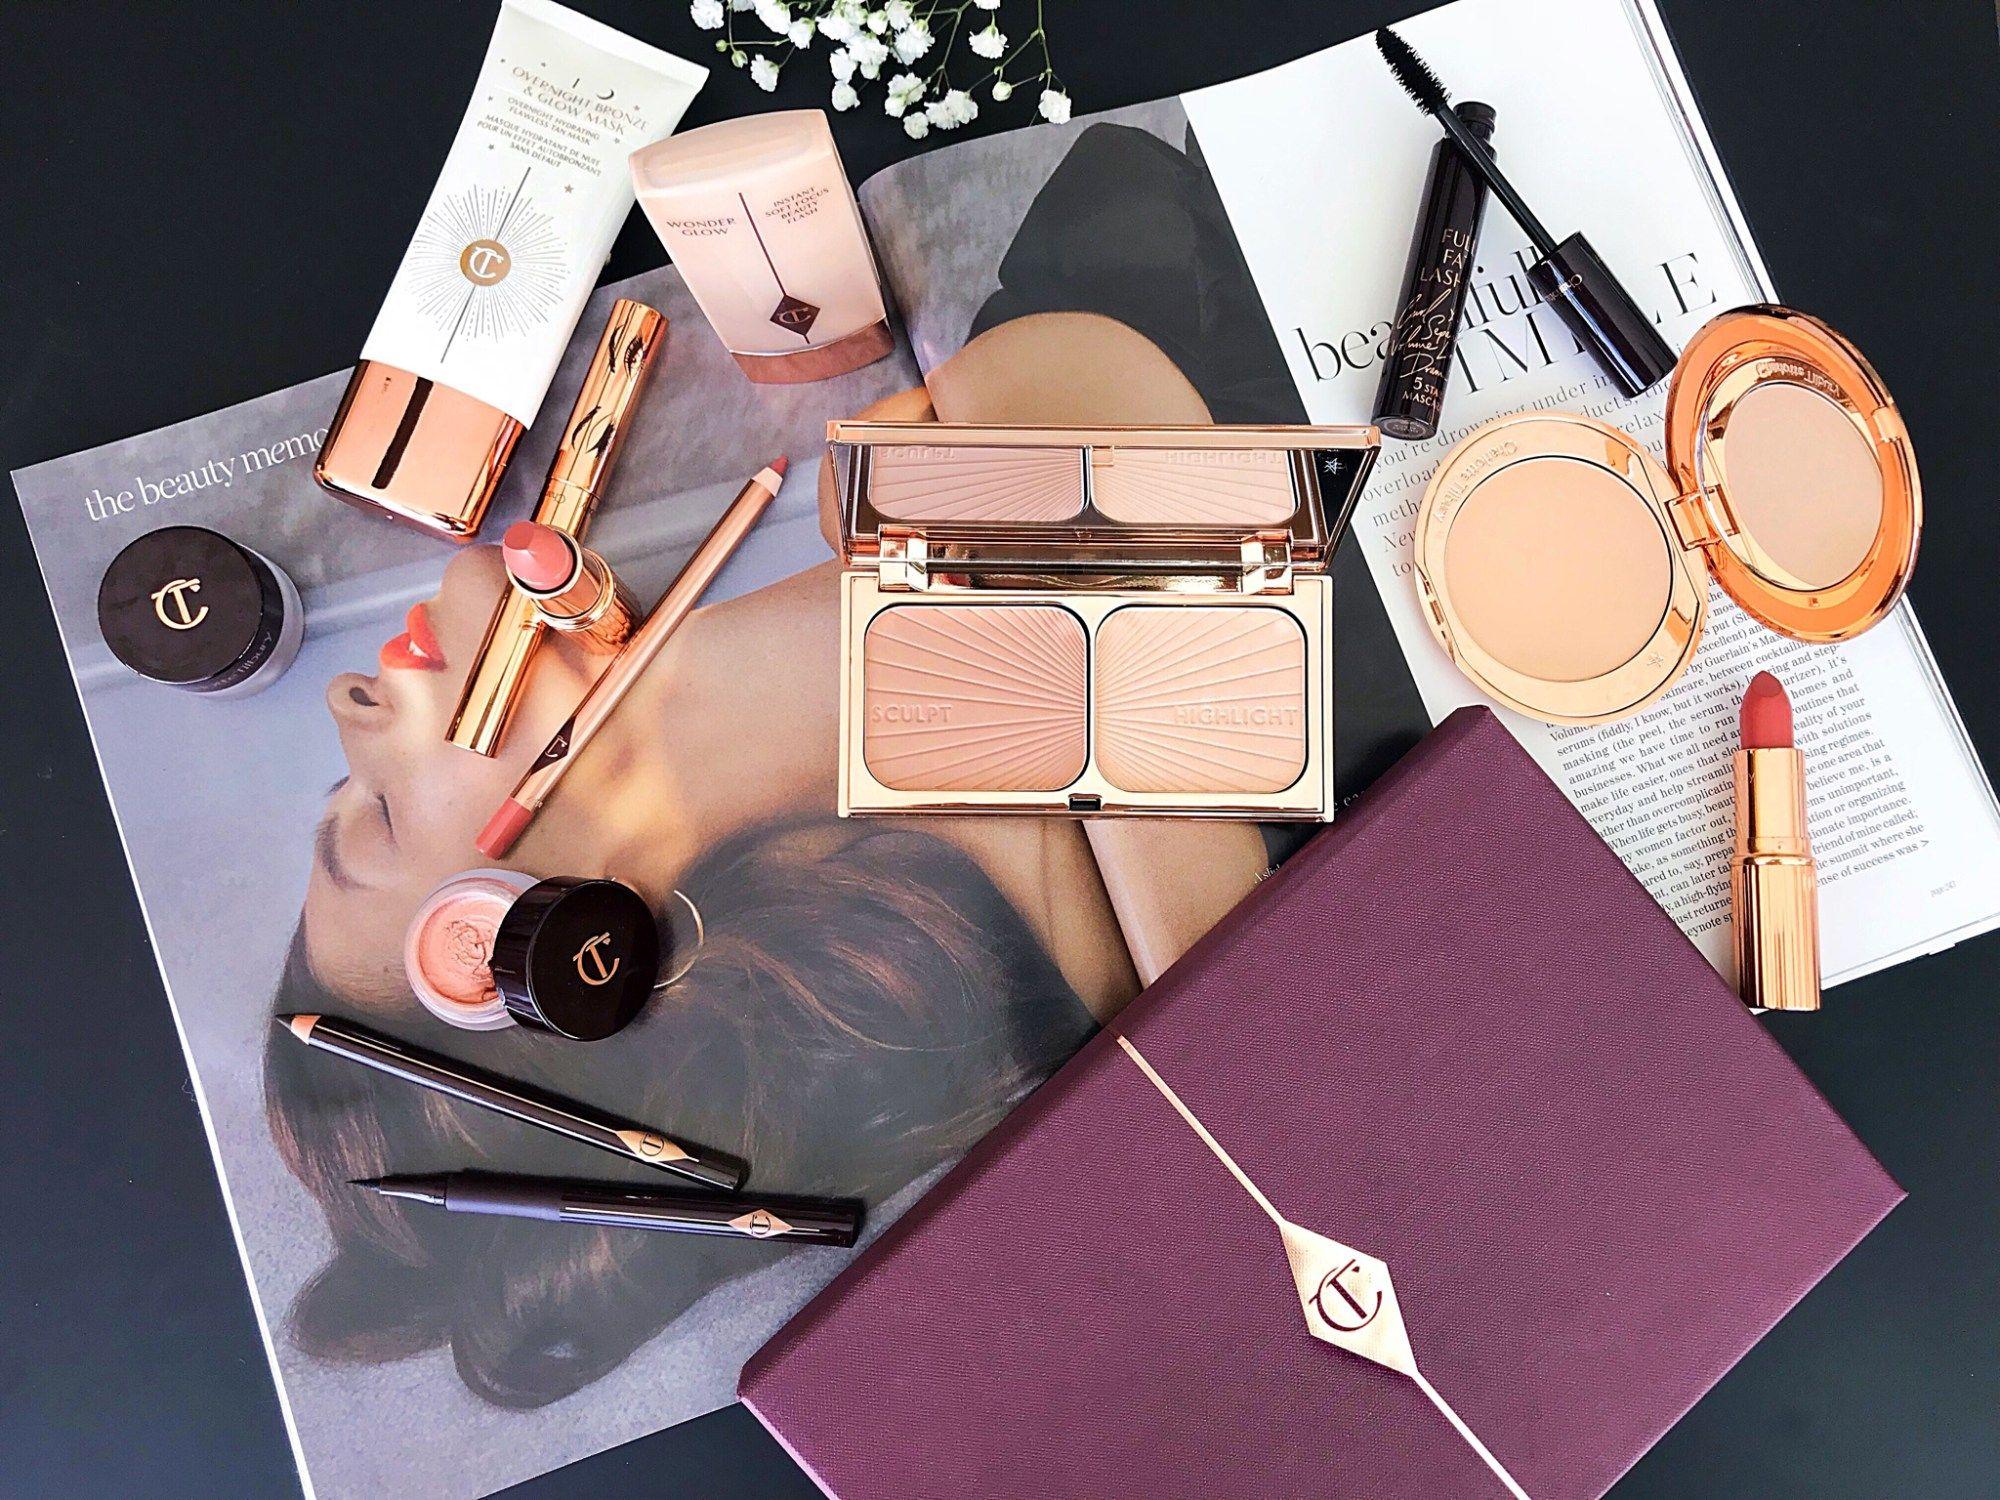 Косметика charlotte tilbury купить средство для снятия макияжа эйвон фото